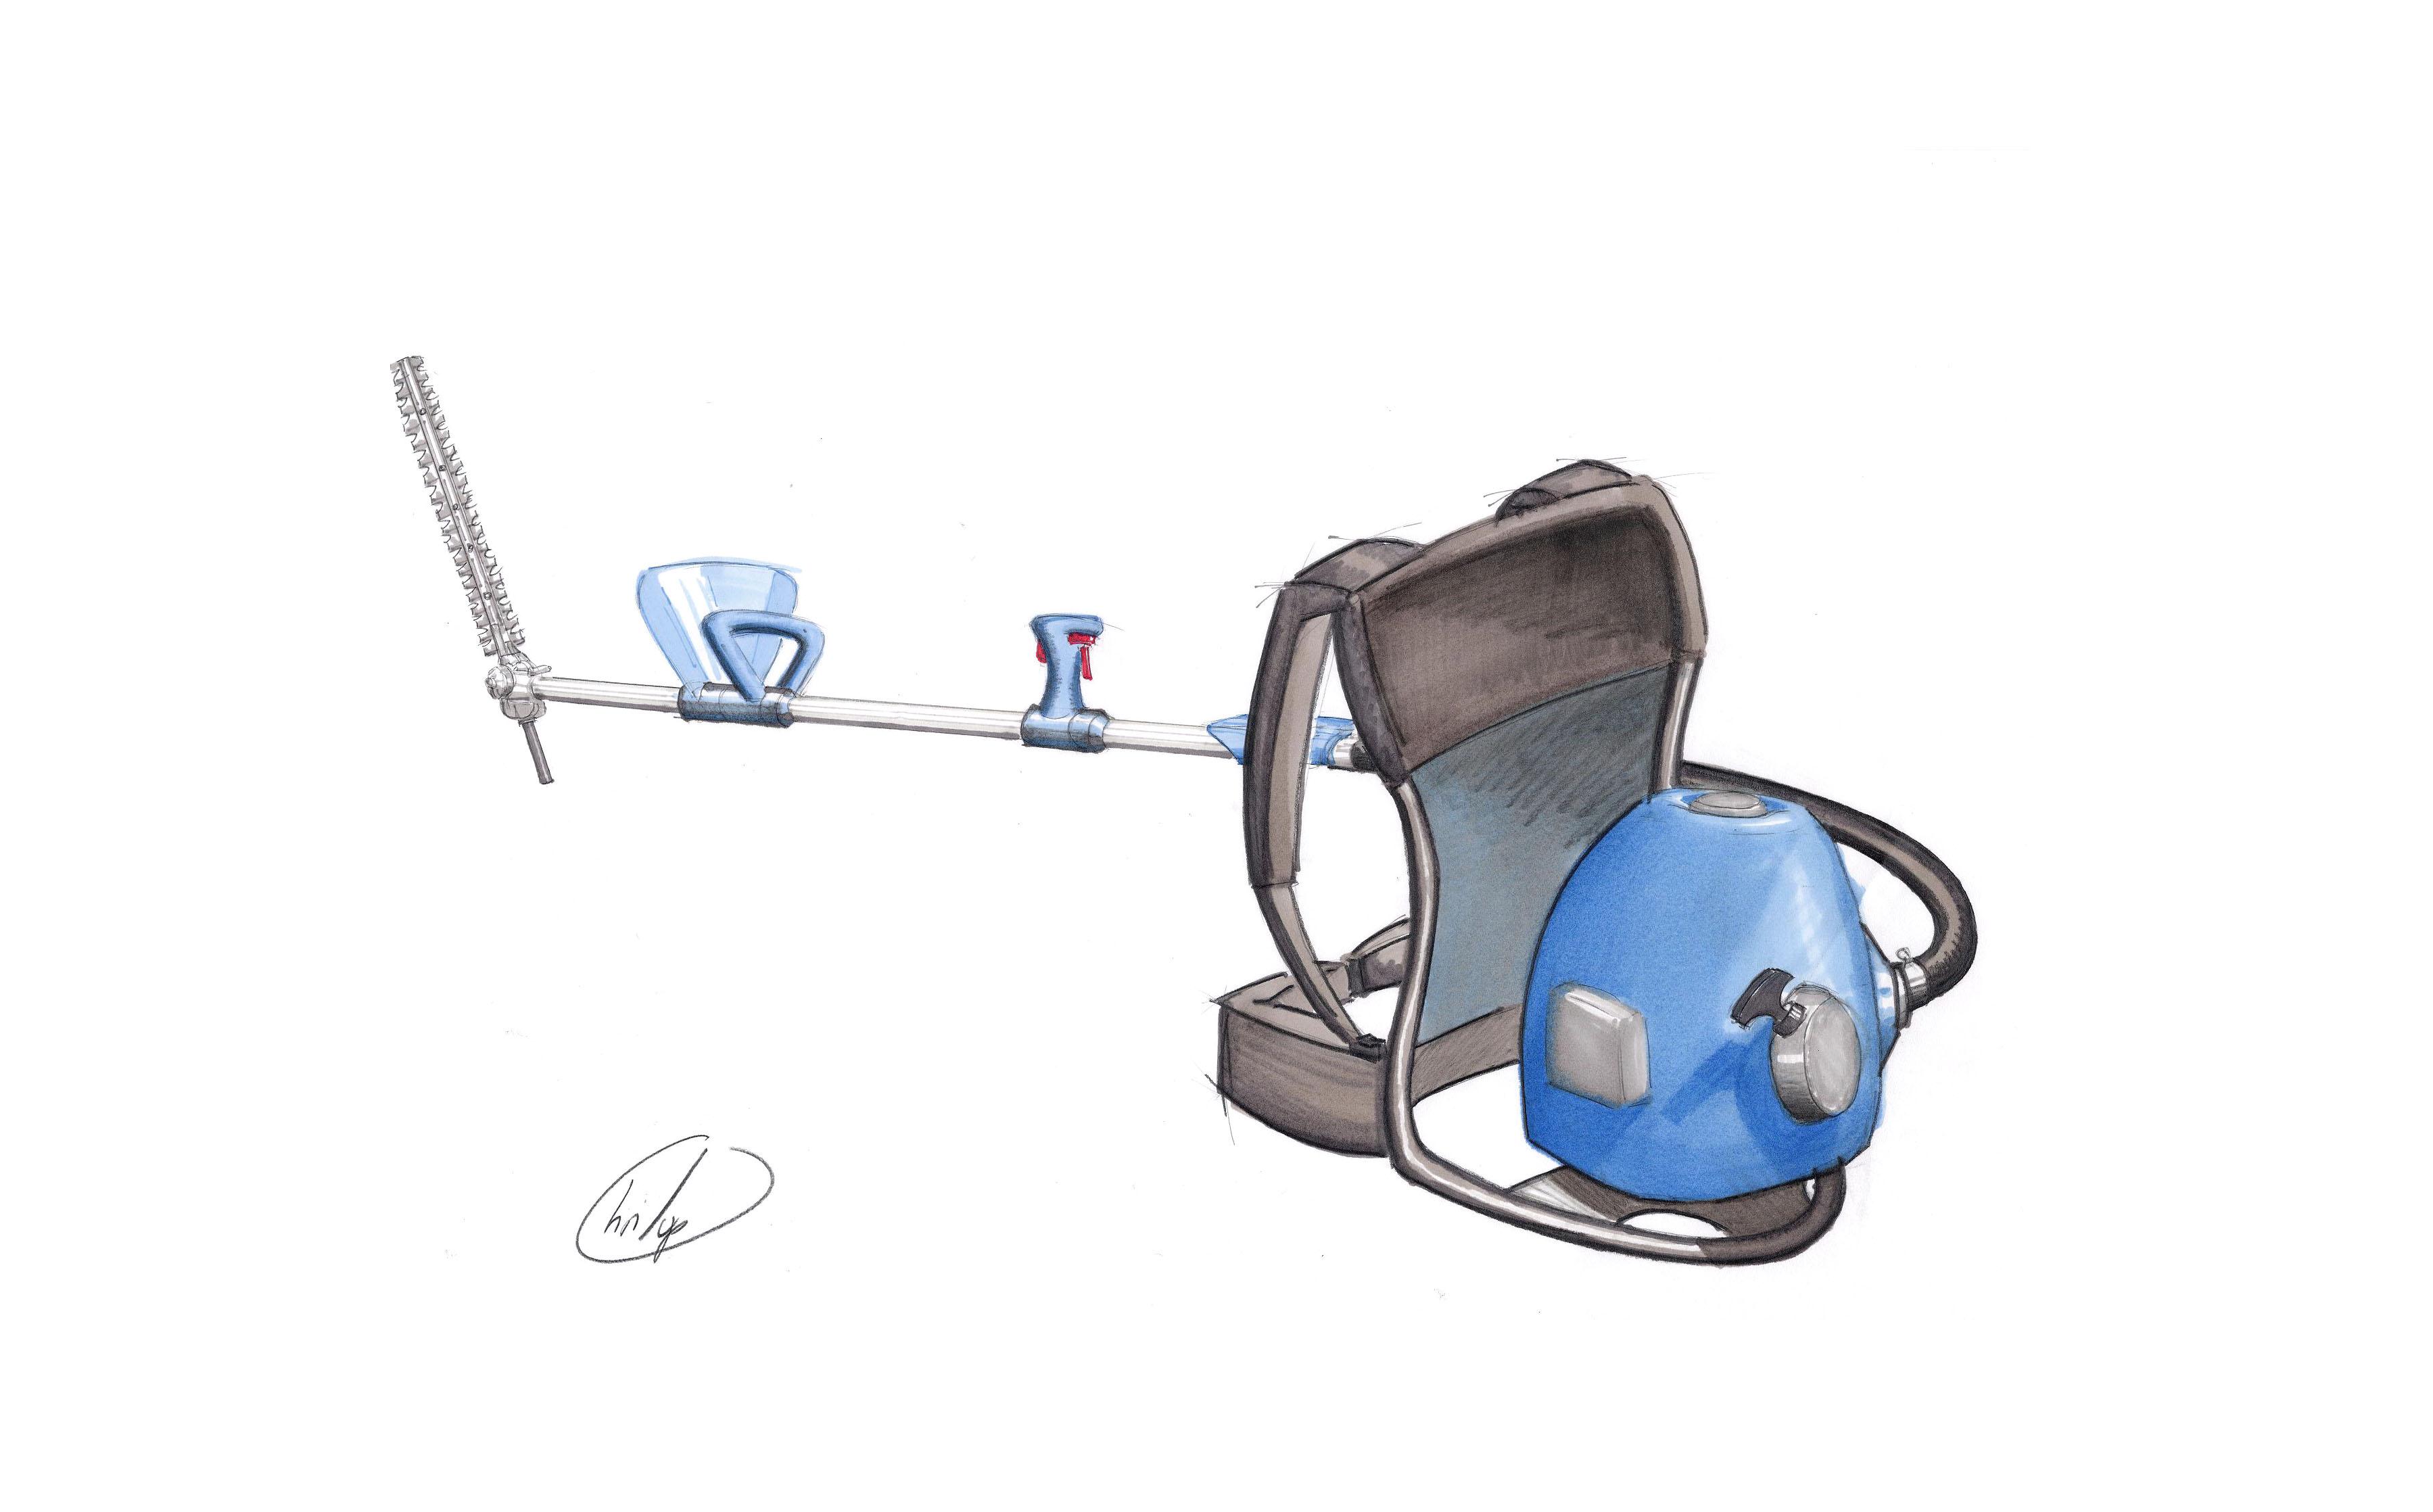 Designfreeze[1]